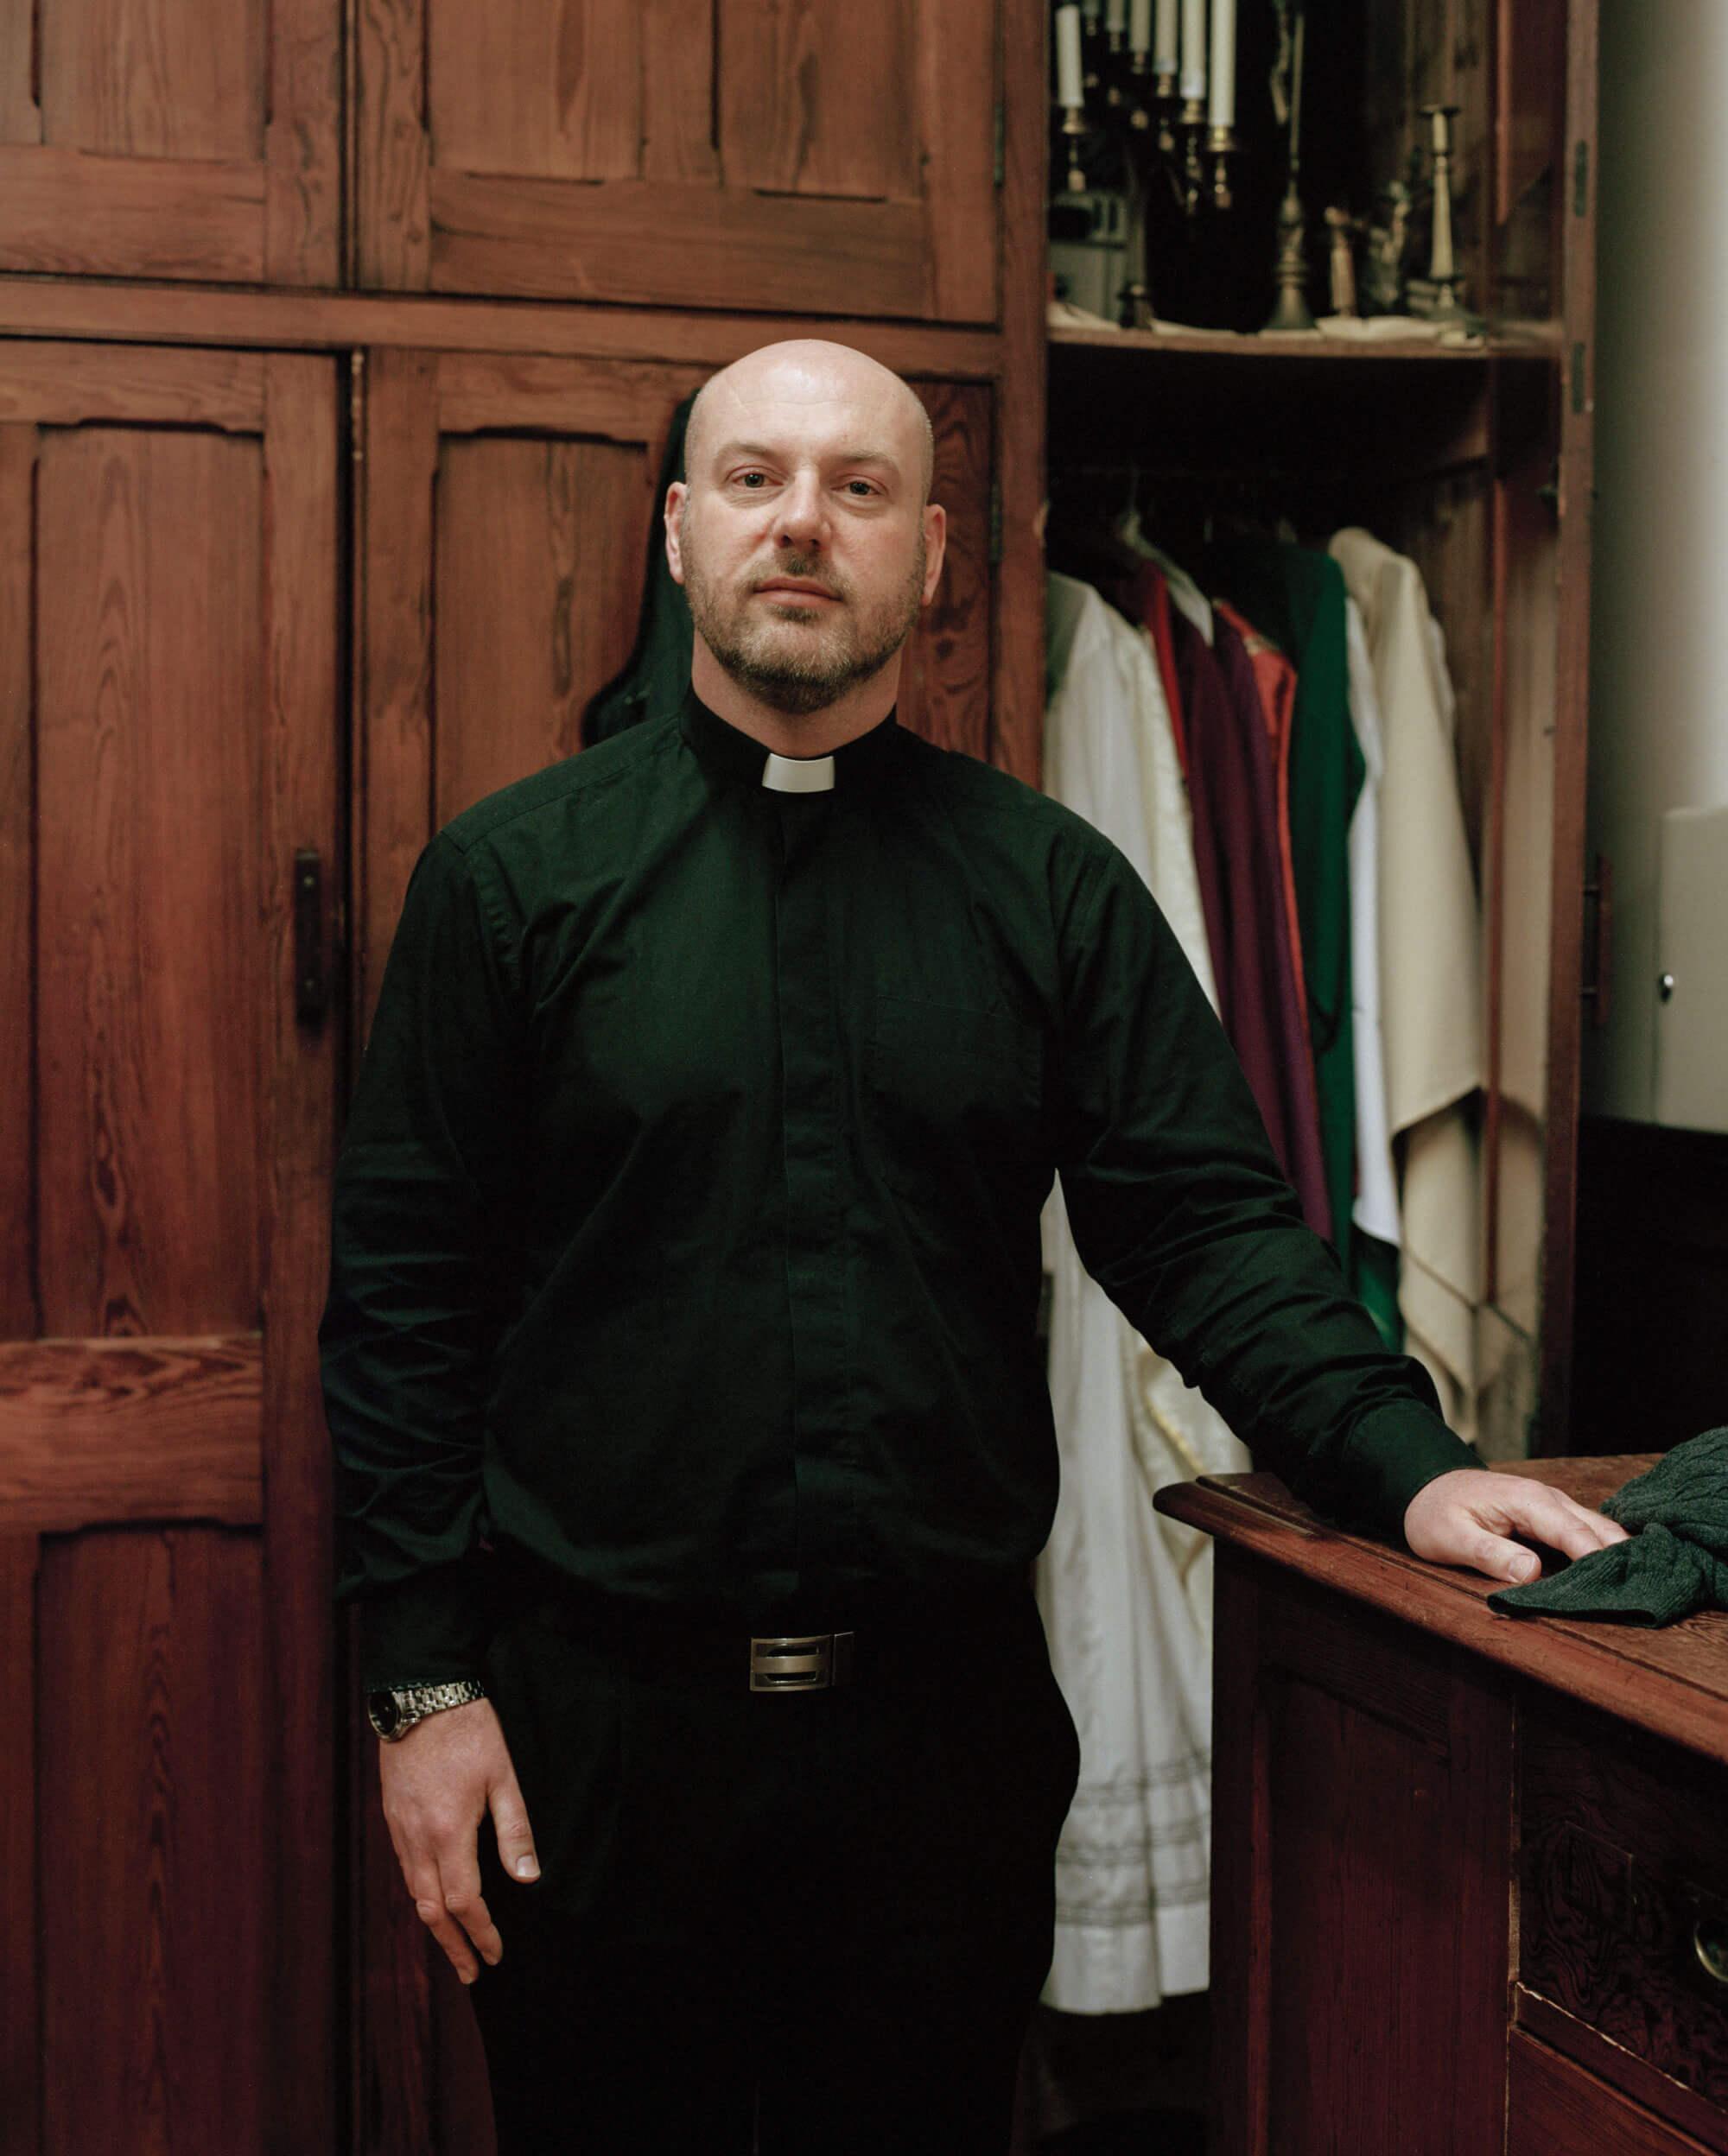 Father ross stood in church robes next to a wardrobe in a Catholic Church matt Scott